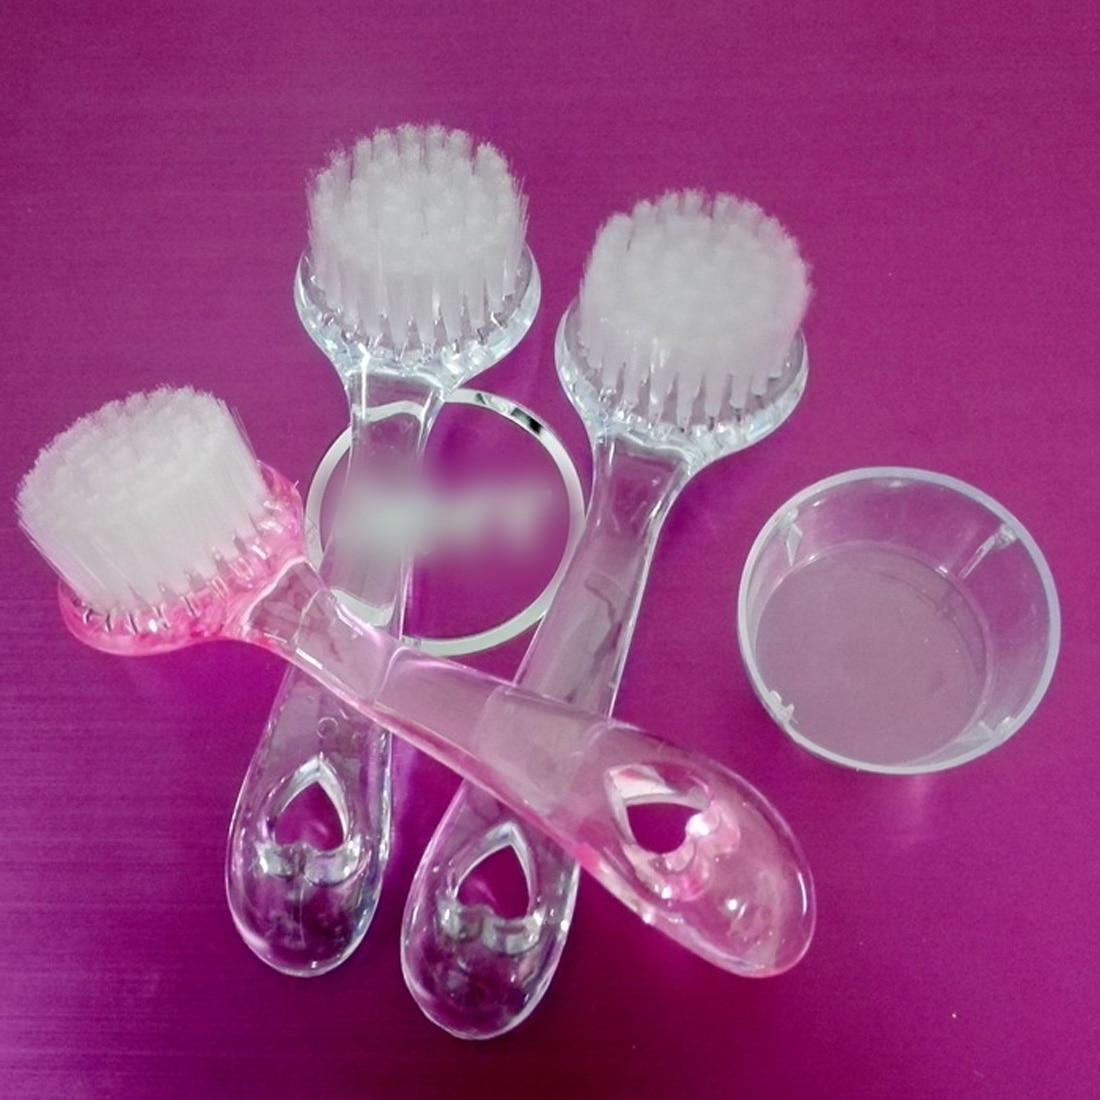 Random Color 1pcs Soft Bristle Brush Scrub Exfoliating Facial Brush Face Care Cleaning Wash Cap Wholesale Quality